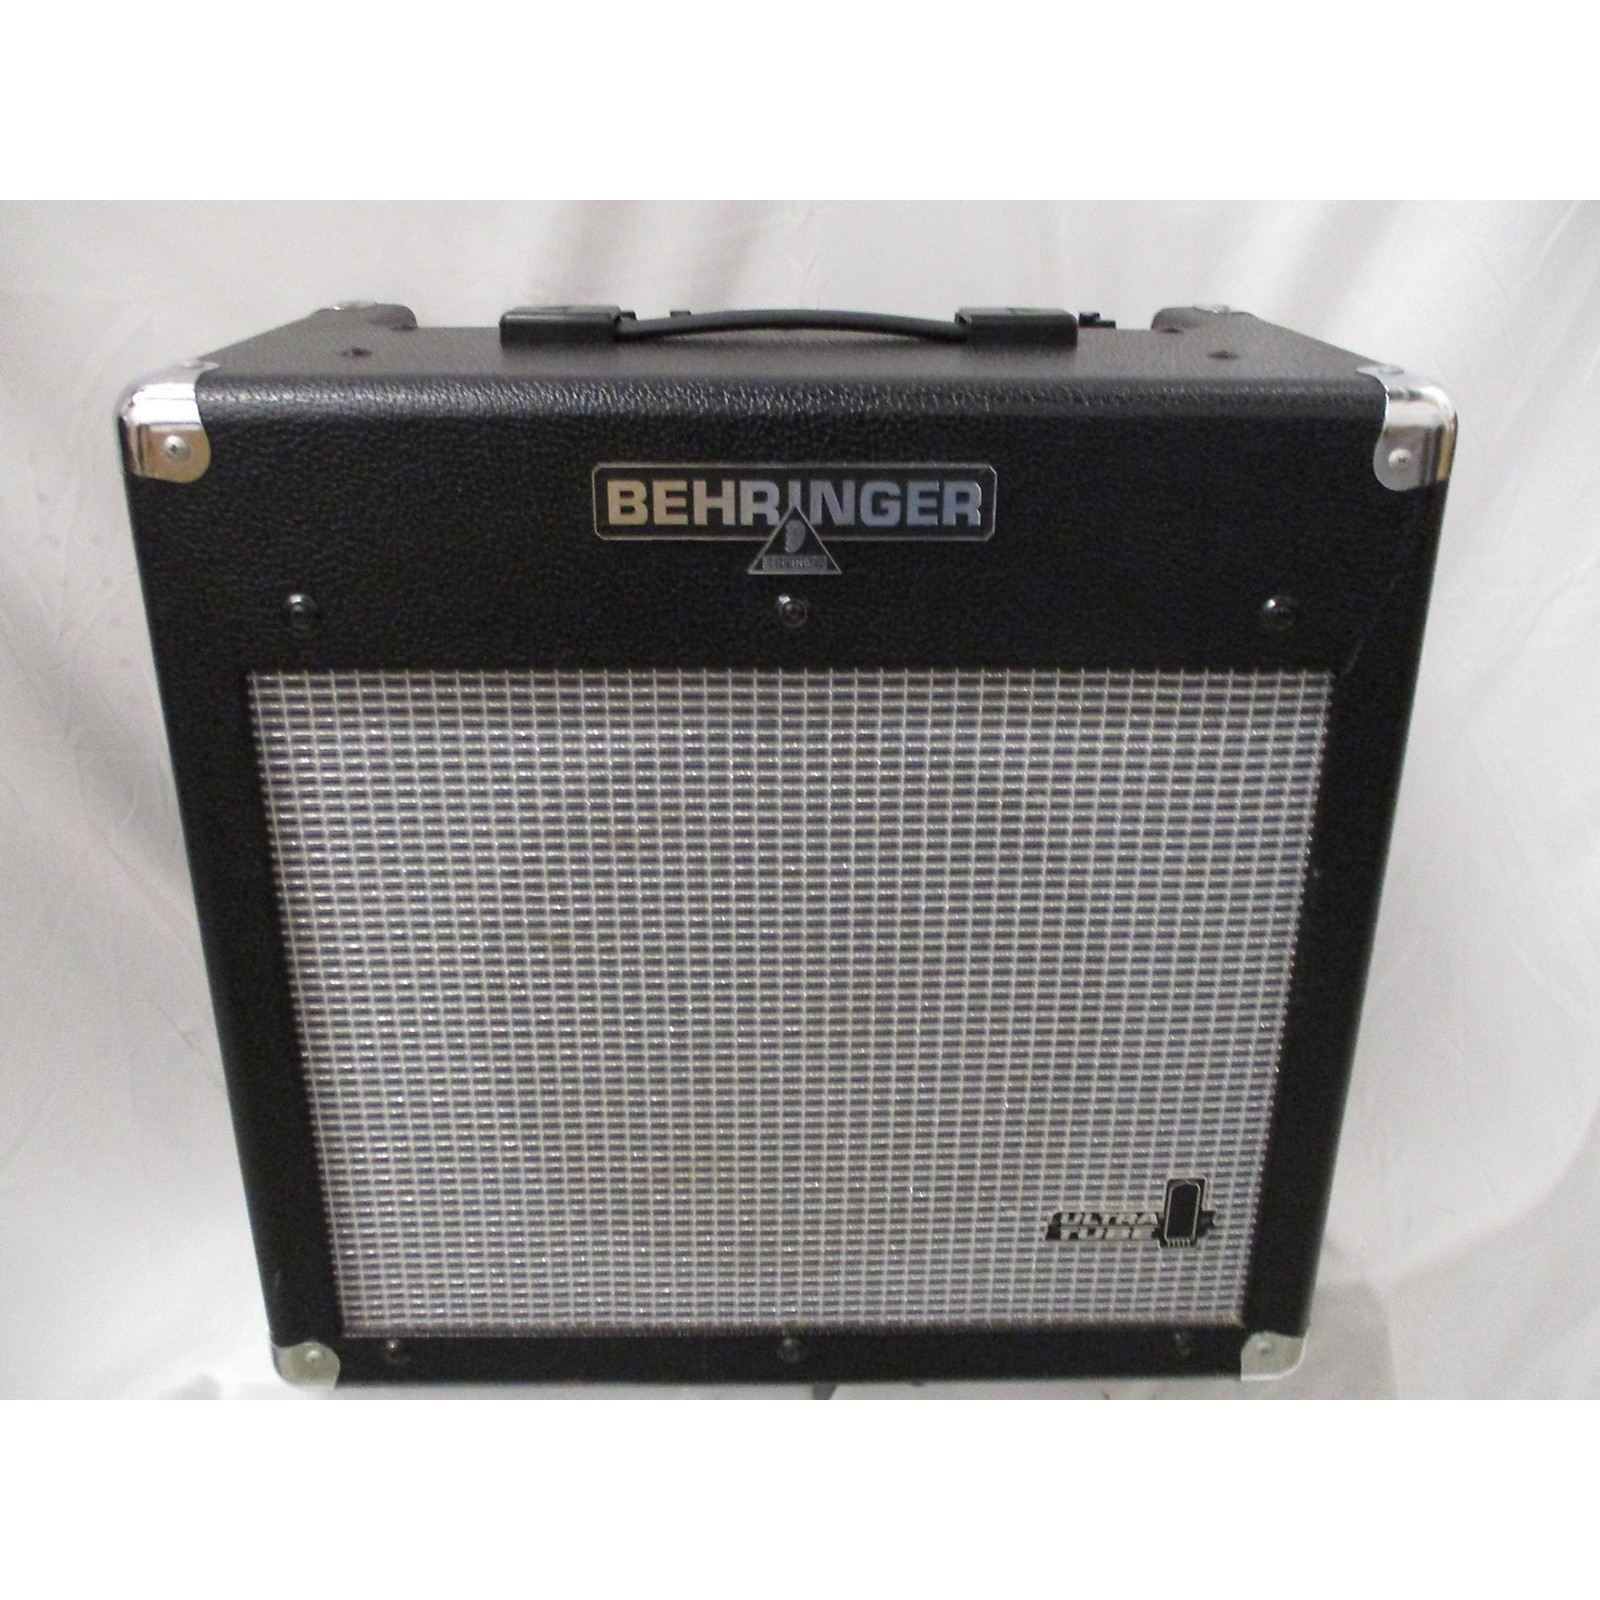 Behringer ULTRA TUBE VINTAGER AC112 Guitar Combo Amp